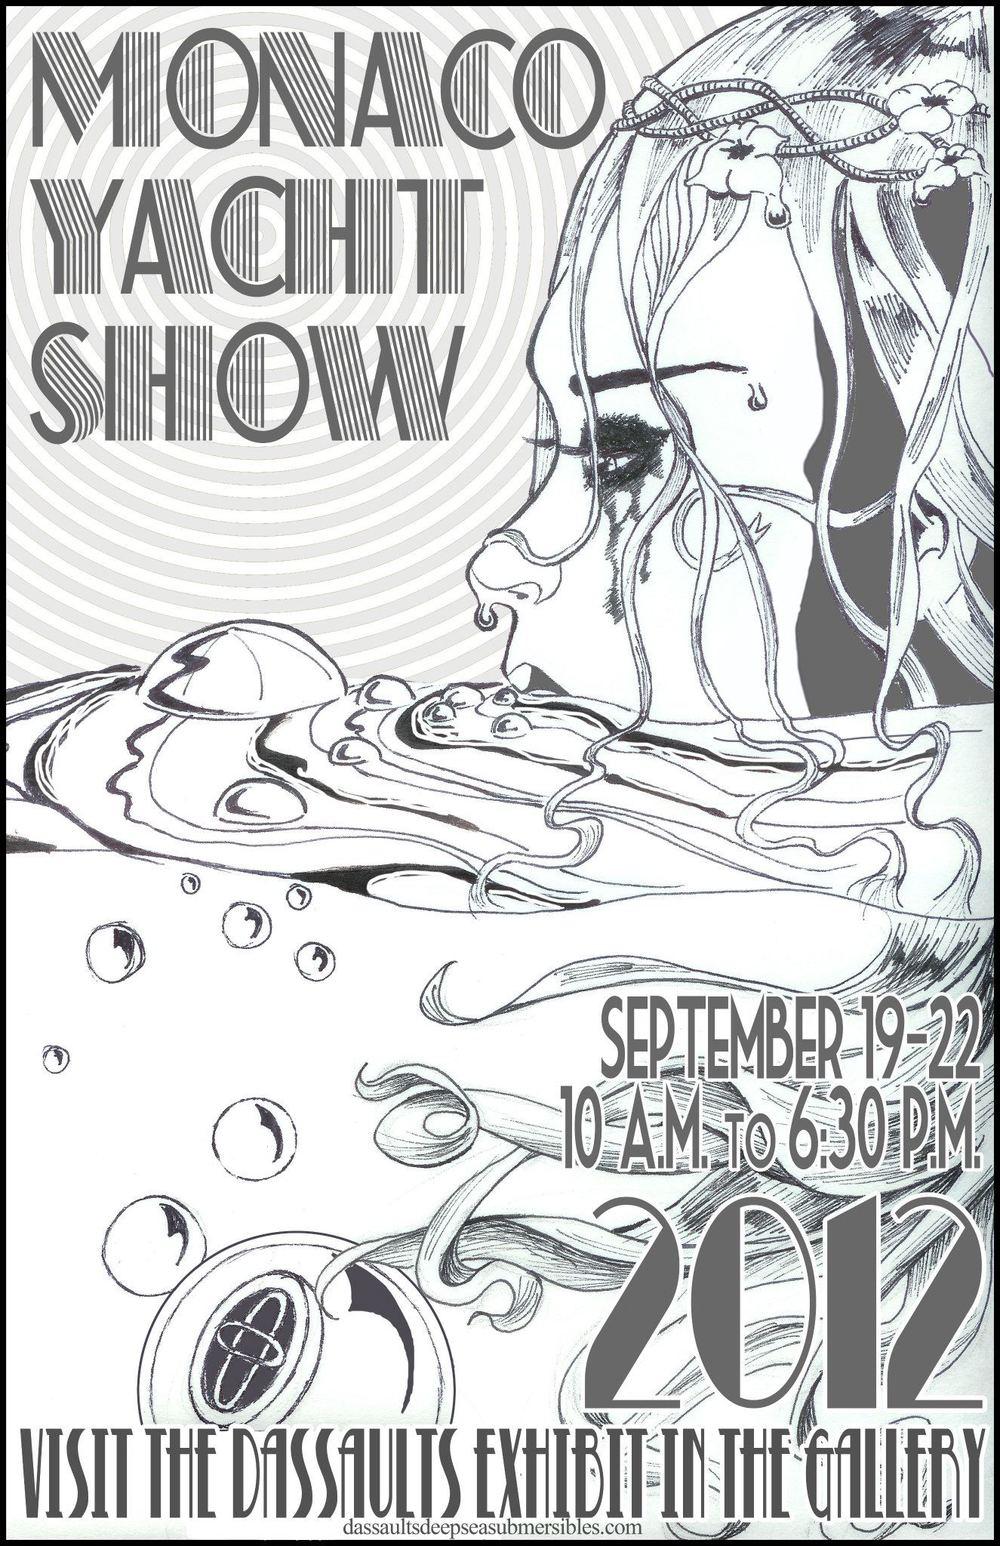 john-copponex-miscellaneous-posters-monaco yacht show.jpg